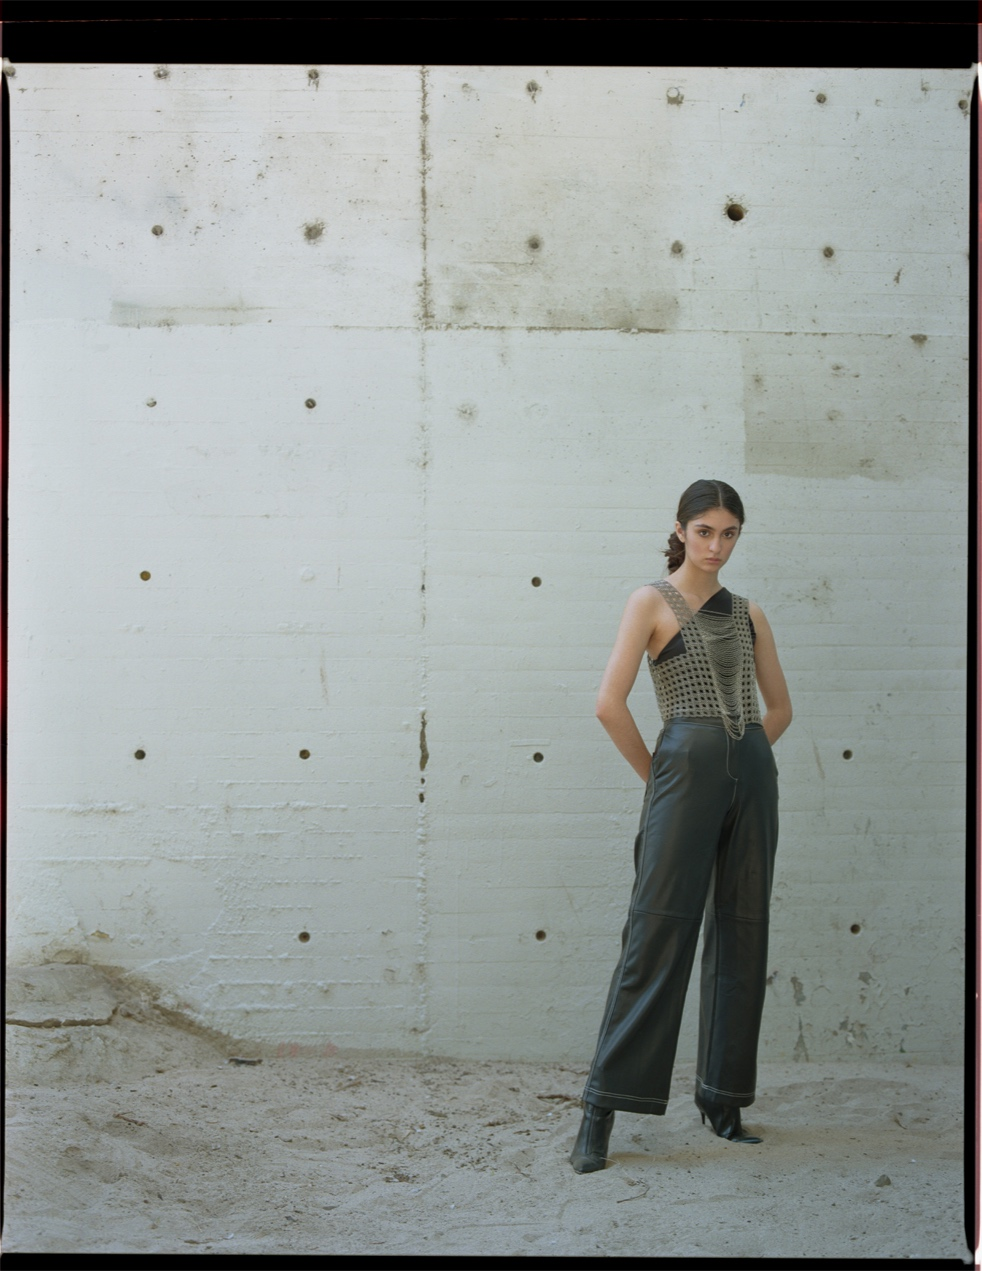 bianca-armer-swayed-shawlace-3.jpg